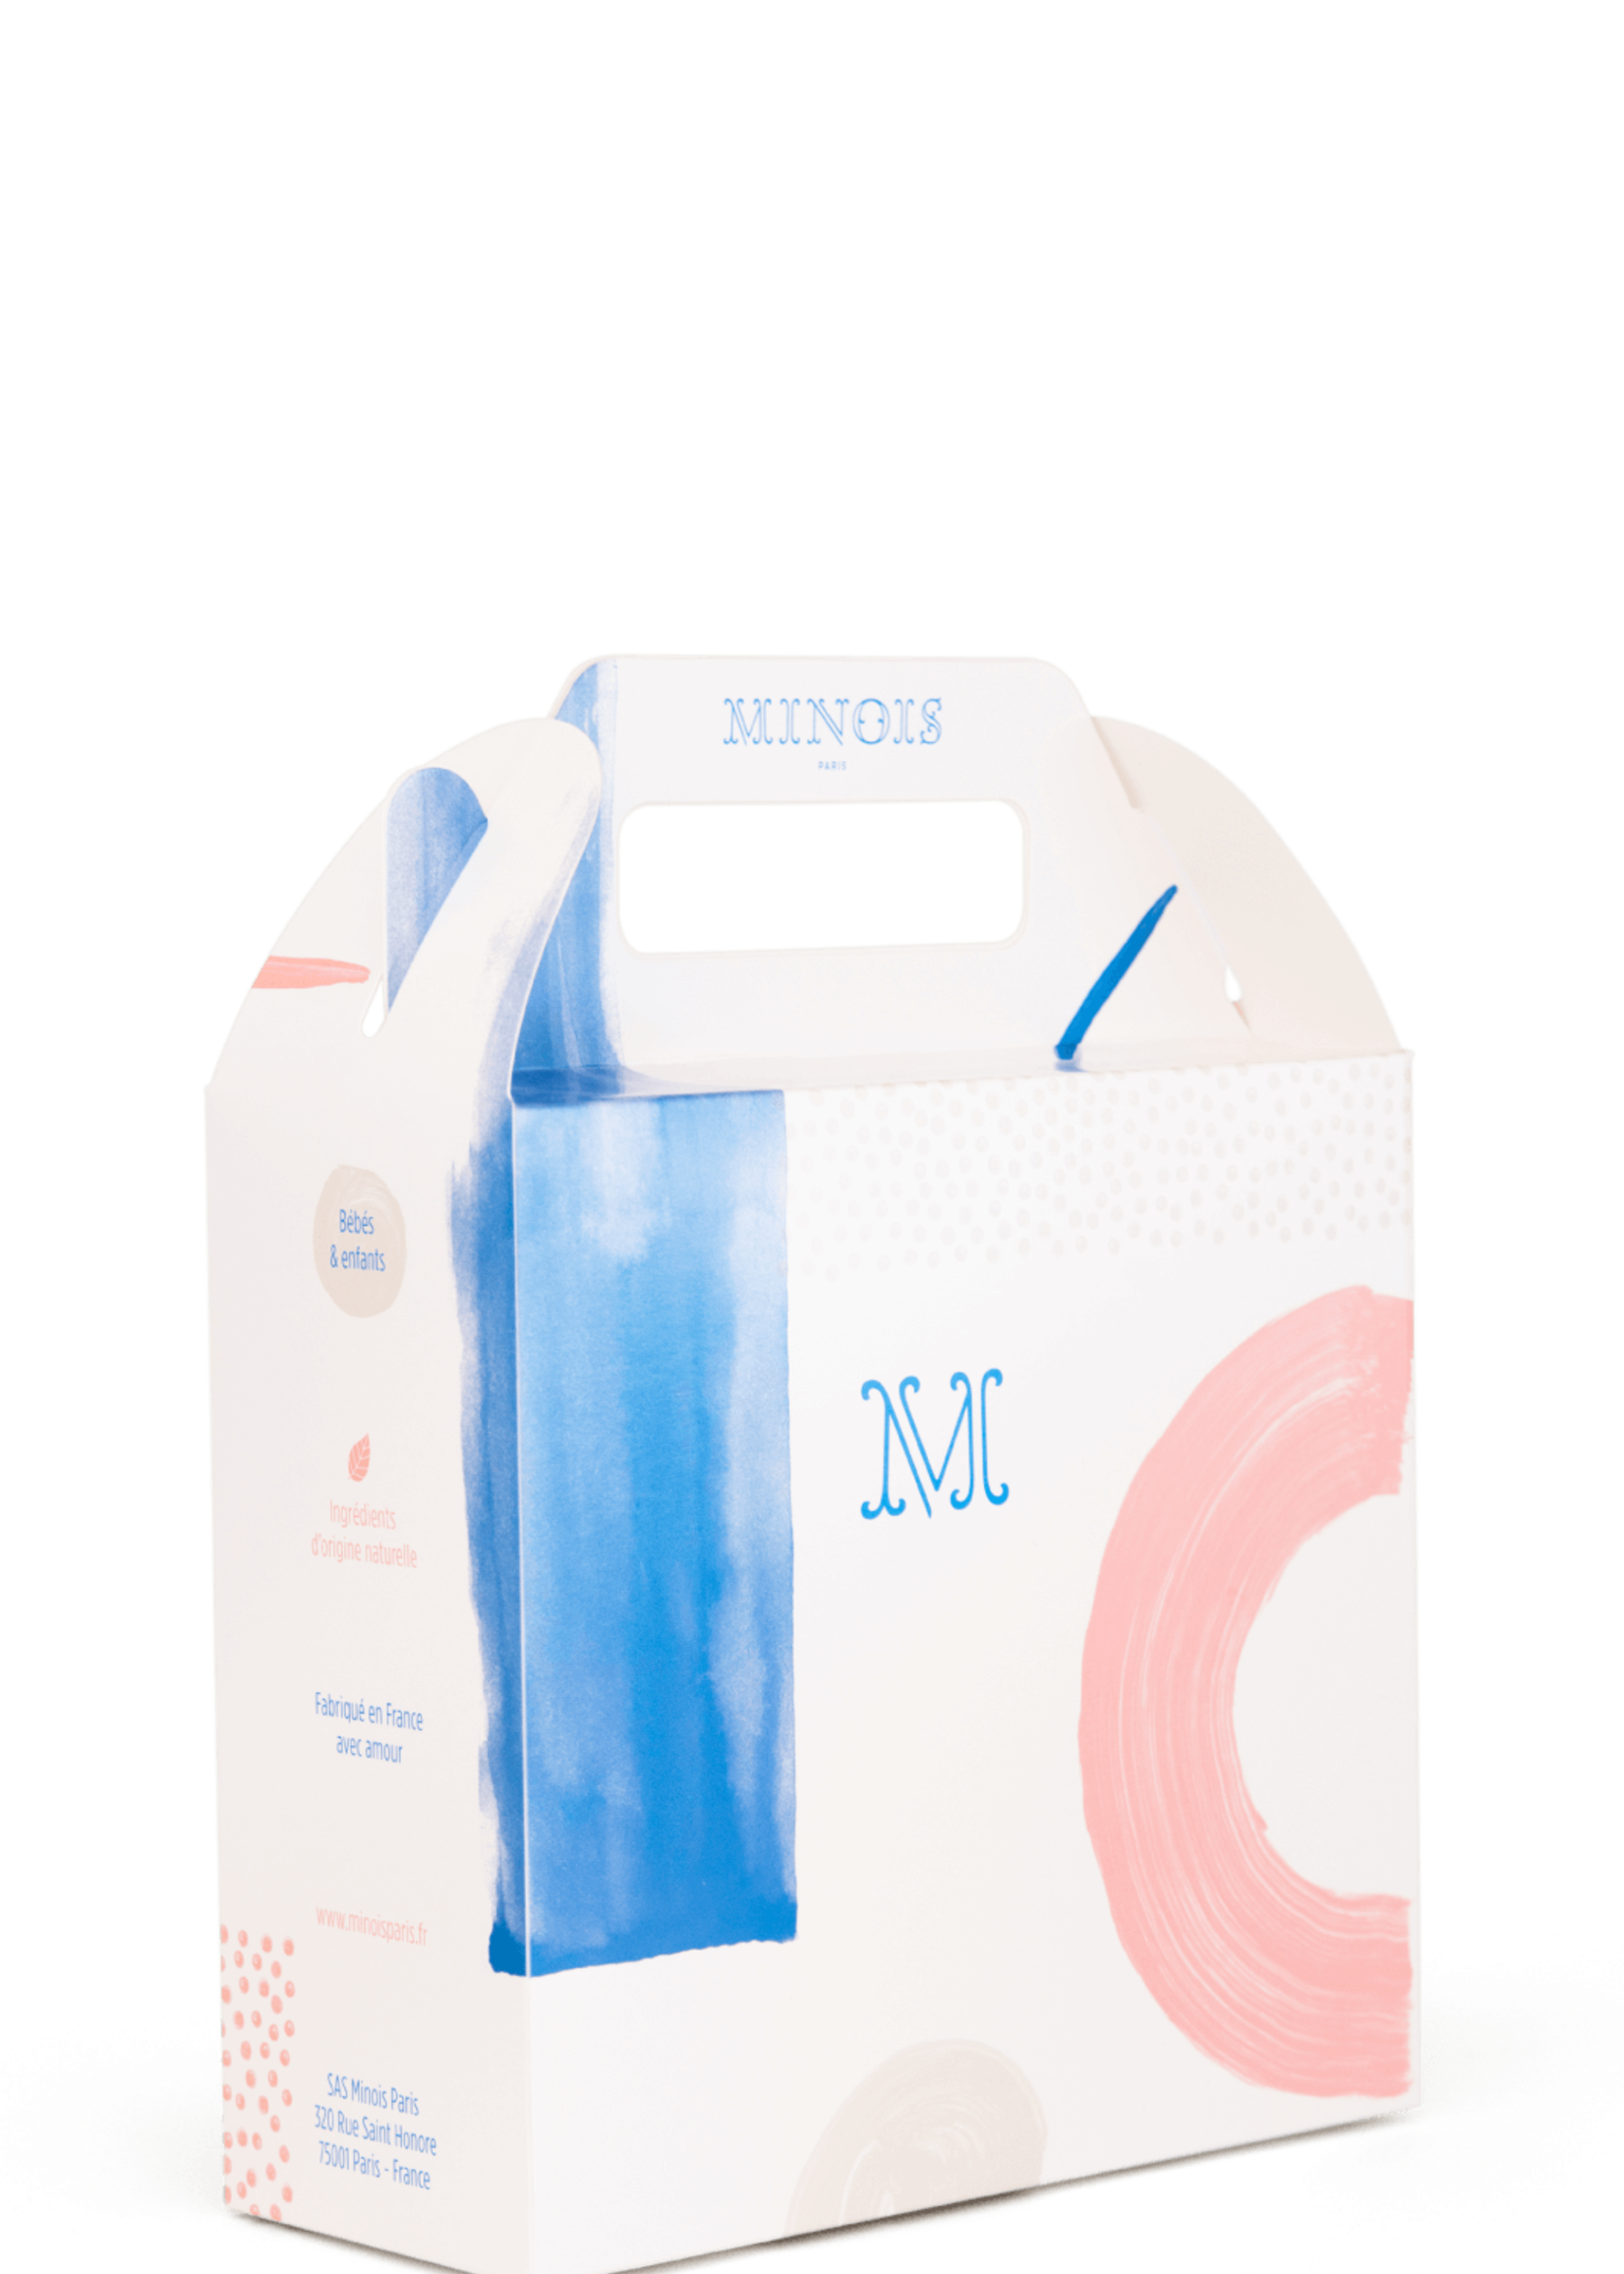 Minois Box Minois - 4 products